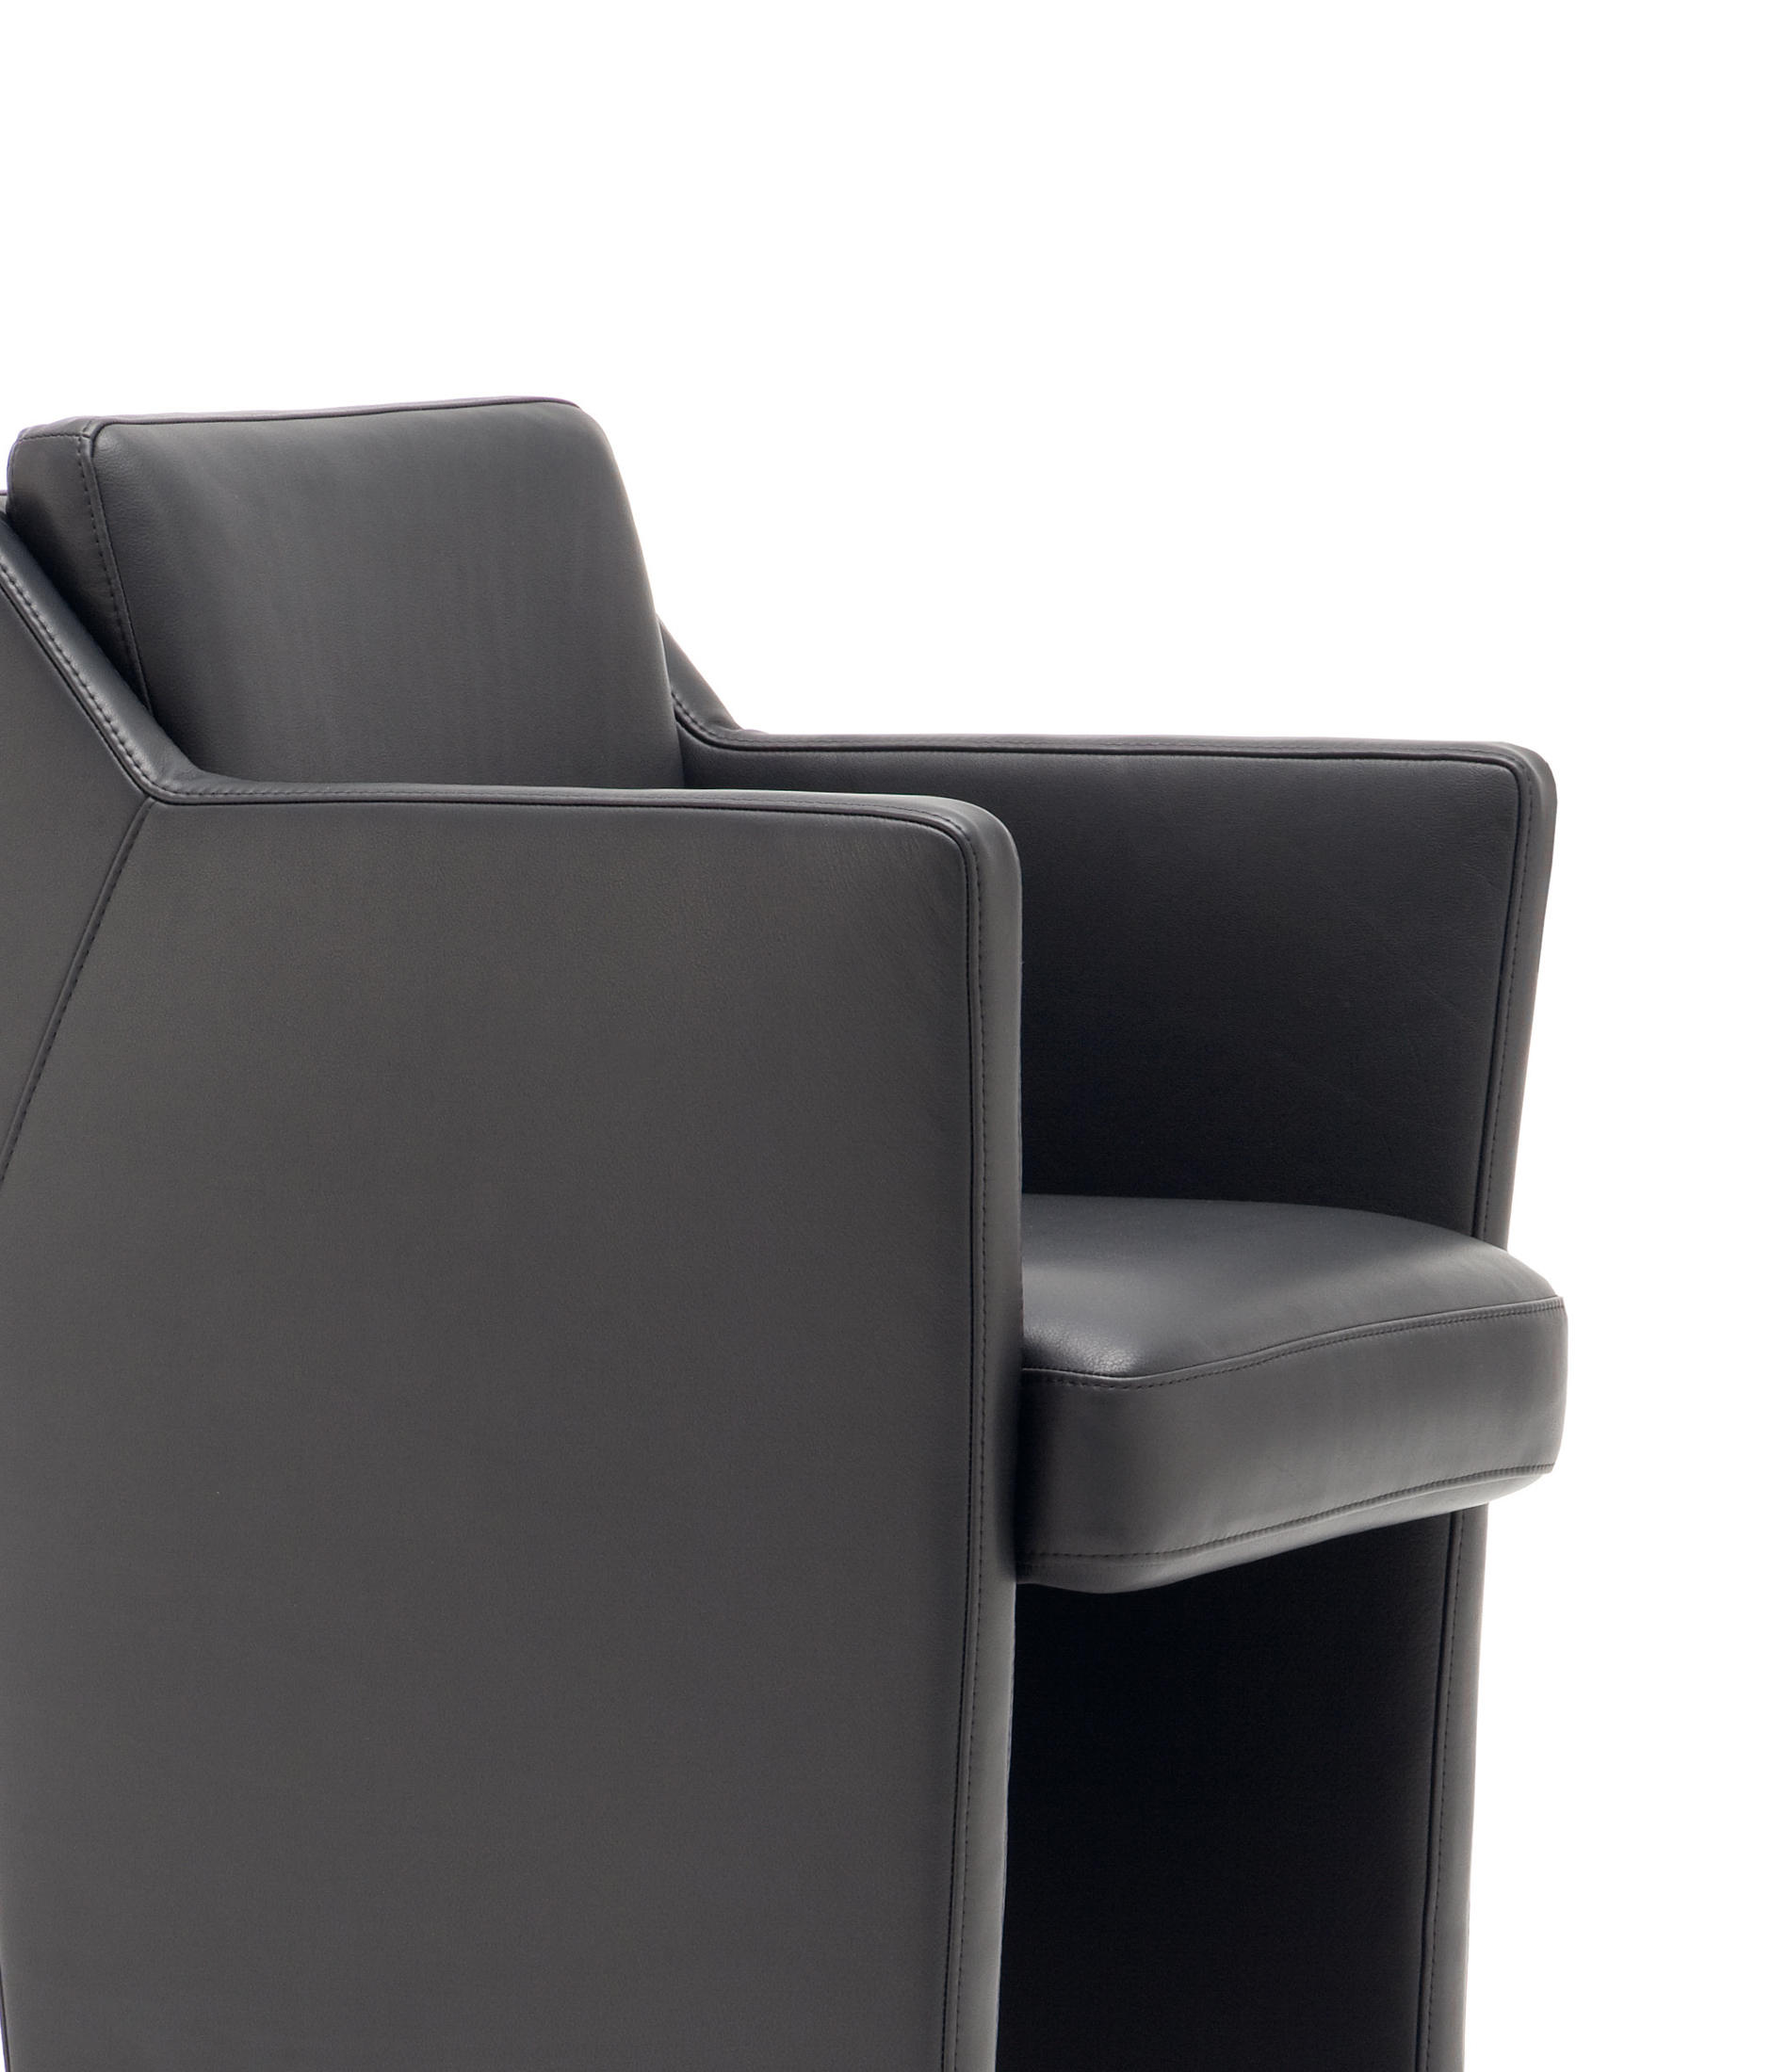 rolf benz 7100 st hle von rolf benz architonic. Black Bedroom Furniture Sets. Home Design Ideas